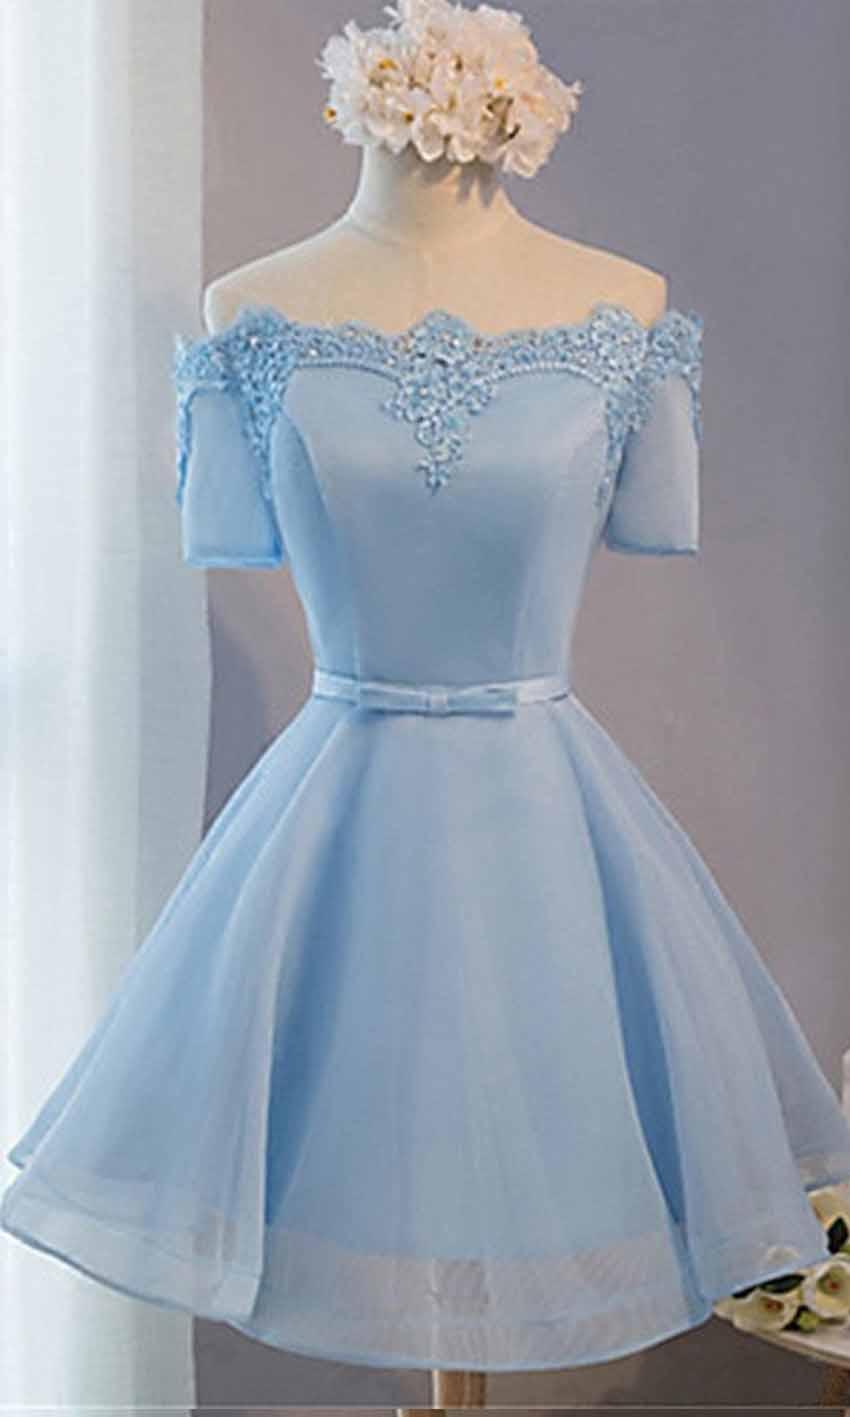 7e26c7a667b Cute Blue Off Shoulder Short Prom Dress Short Sleeves KSP446 ...